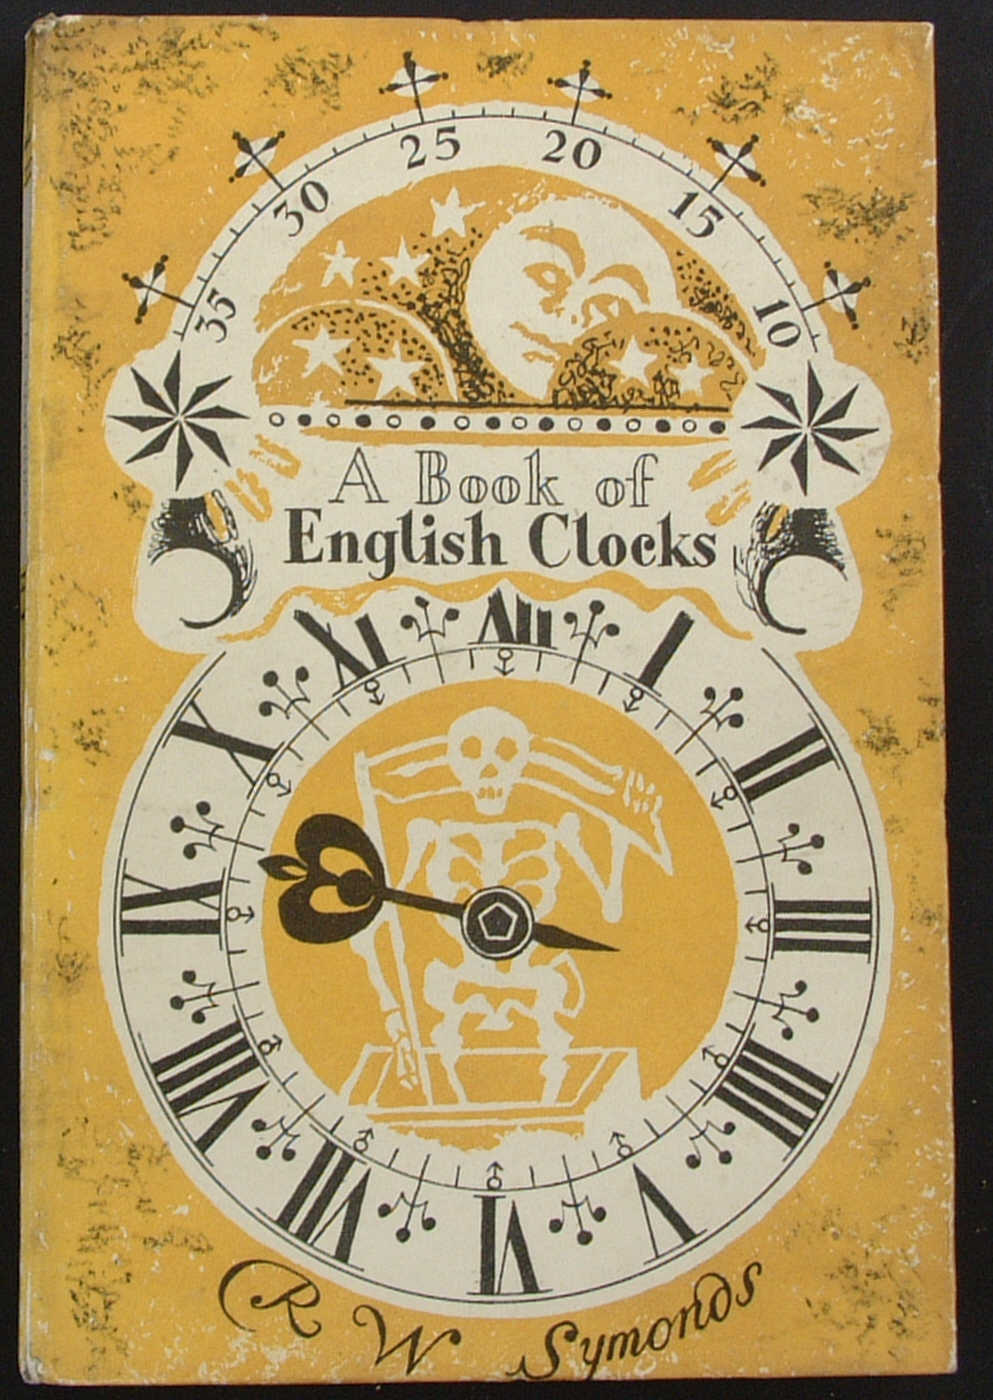 Penguin Book Cover History : Art Англия иллюстратор on pinterest children s